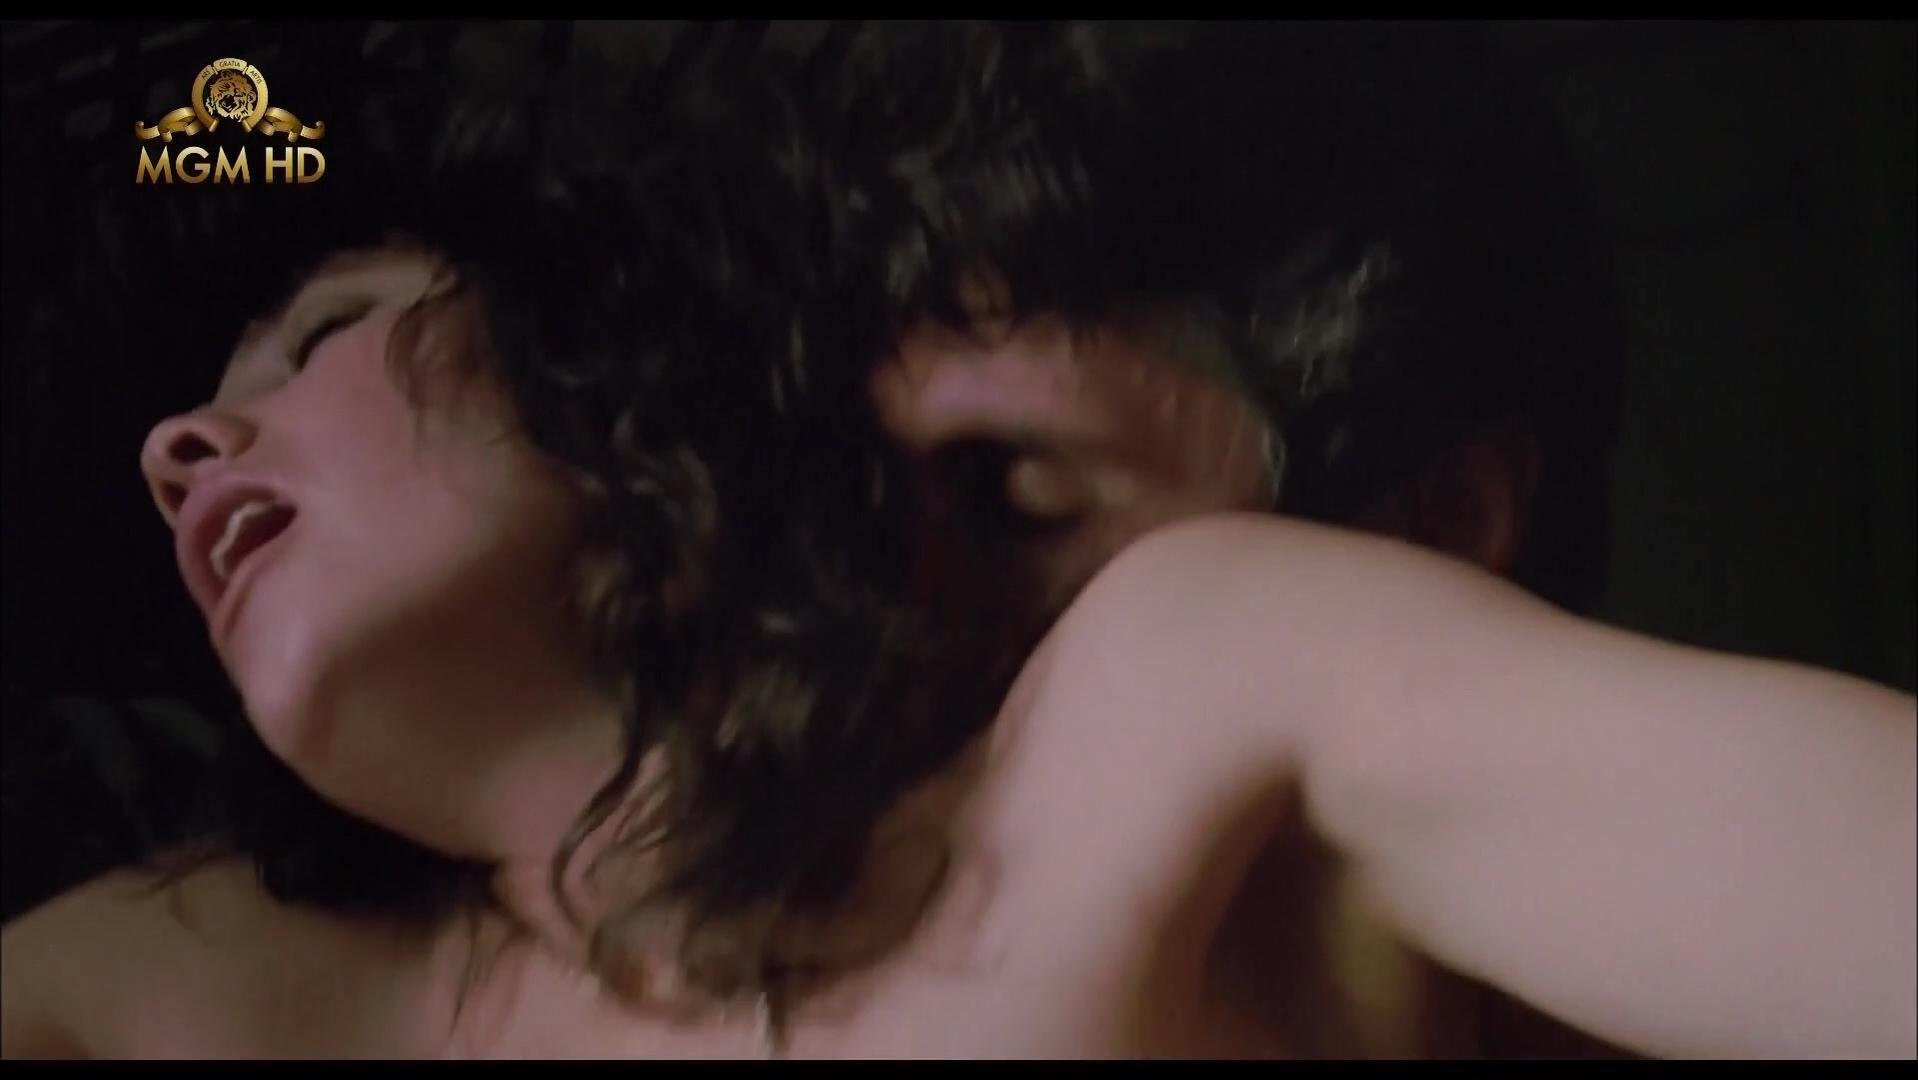 Daphne Zuniga nude - Last Rites (1988)